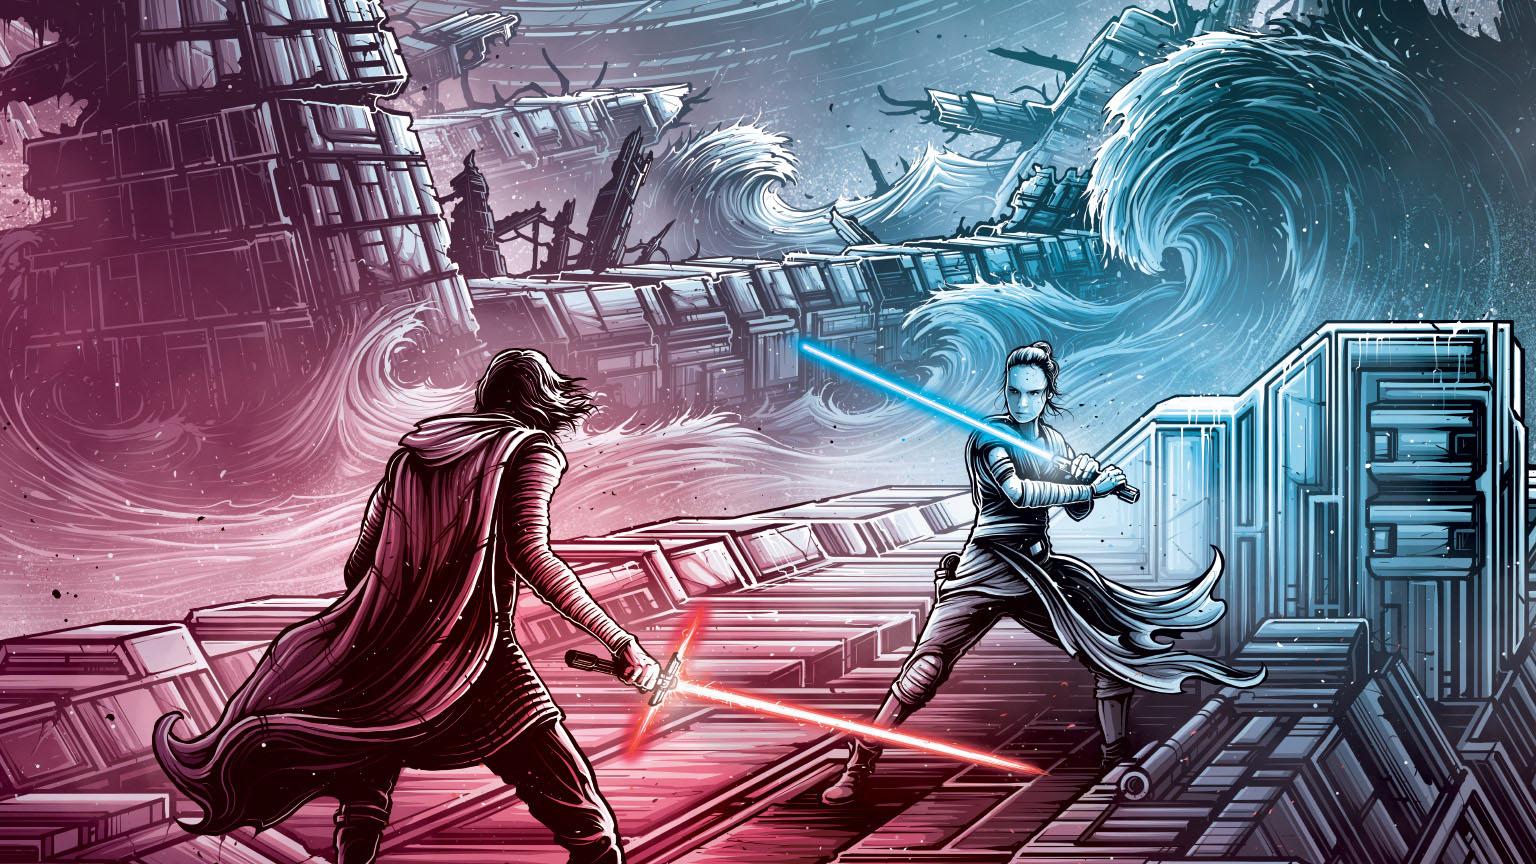 Star Wars The Rise Of Skywalker Imax Poster By Dan Mumford Geek Carl